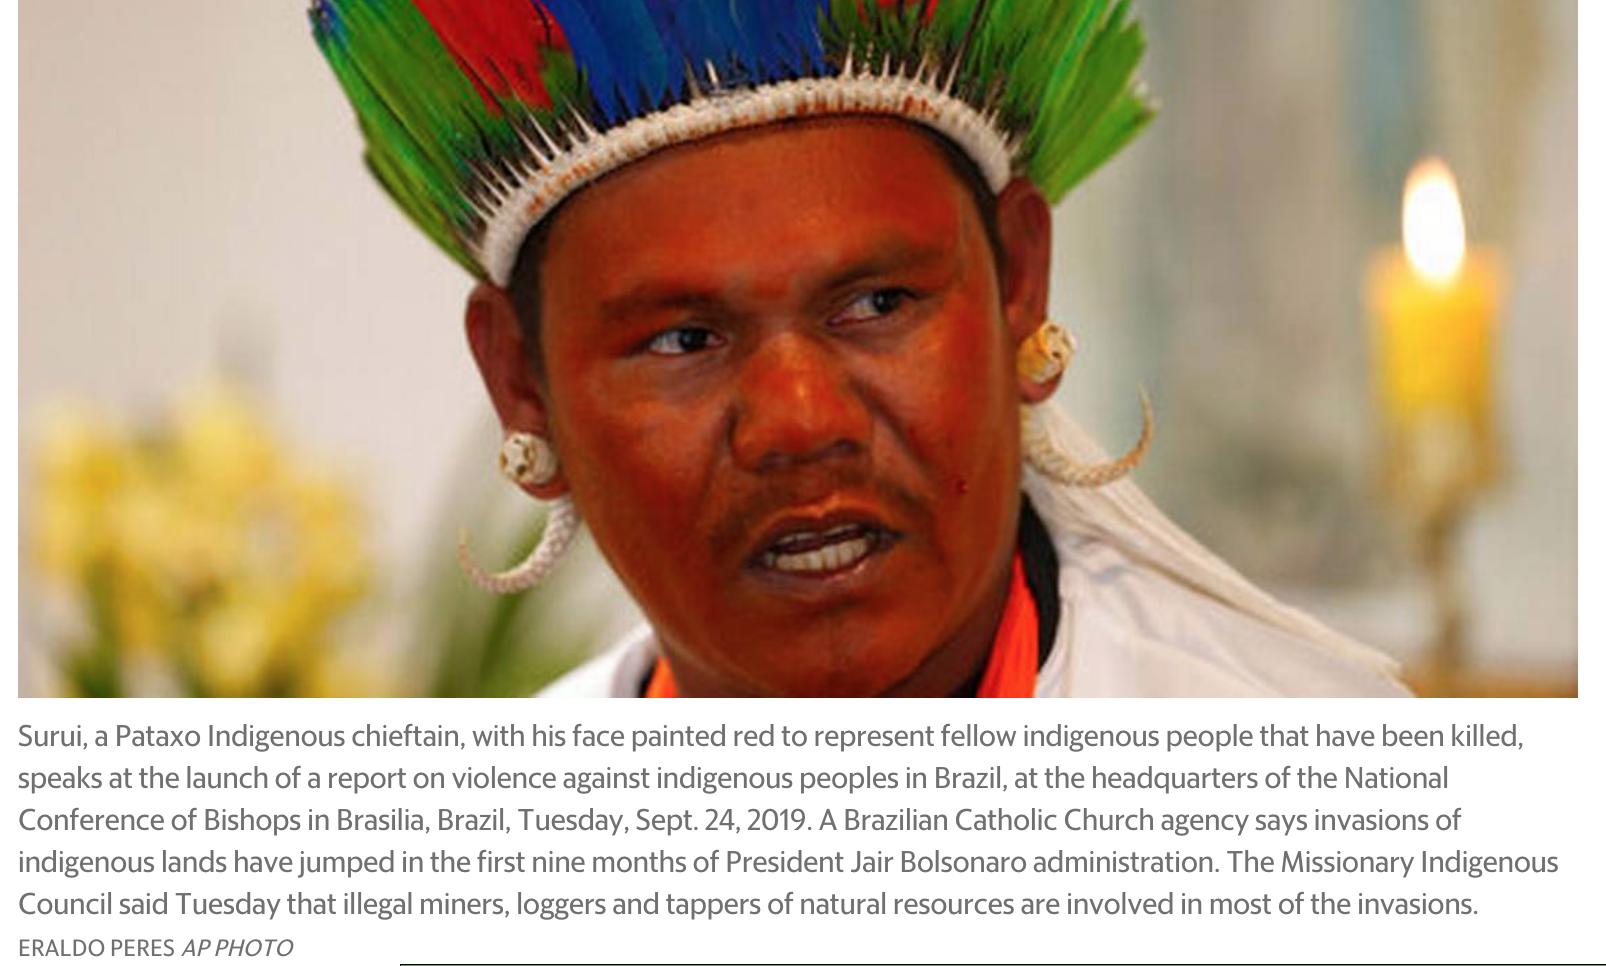 Surui a Pataxo Indigenous chieftain.jpg